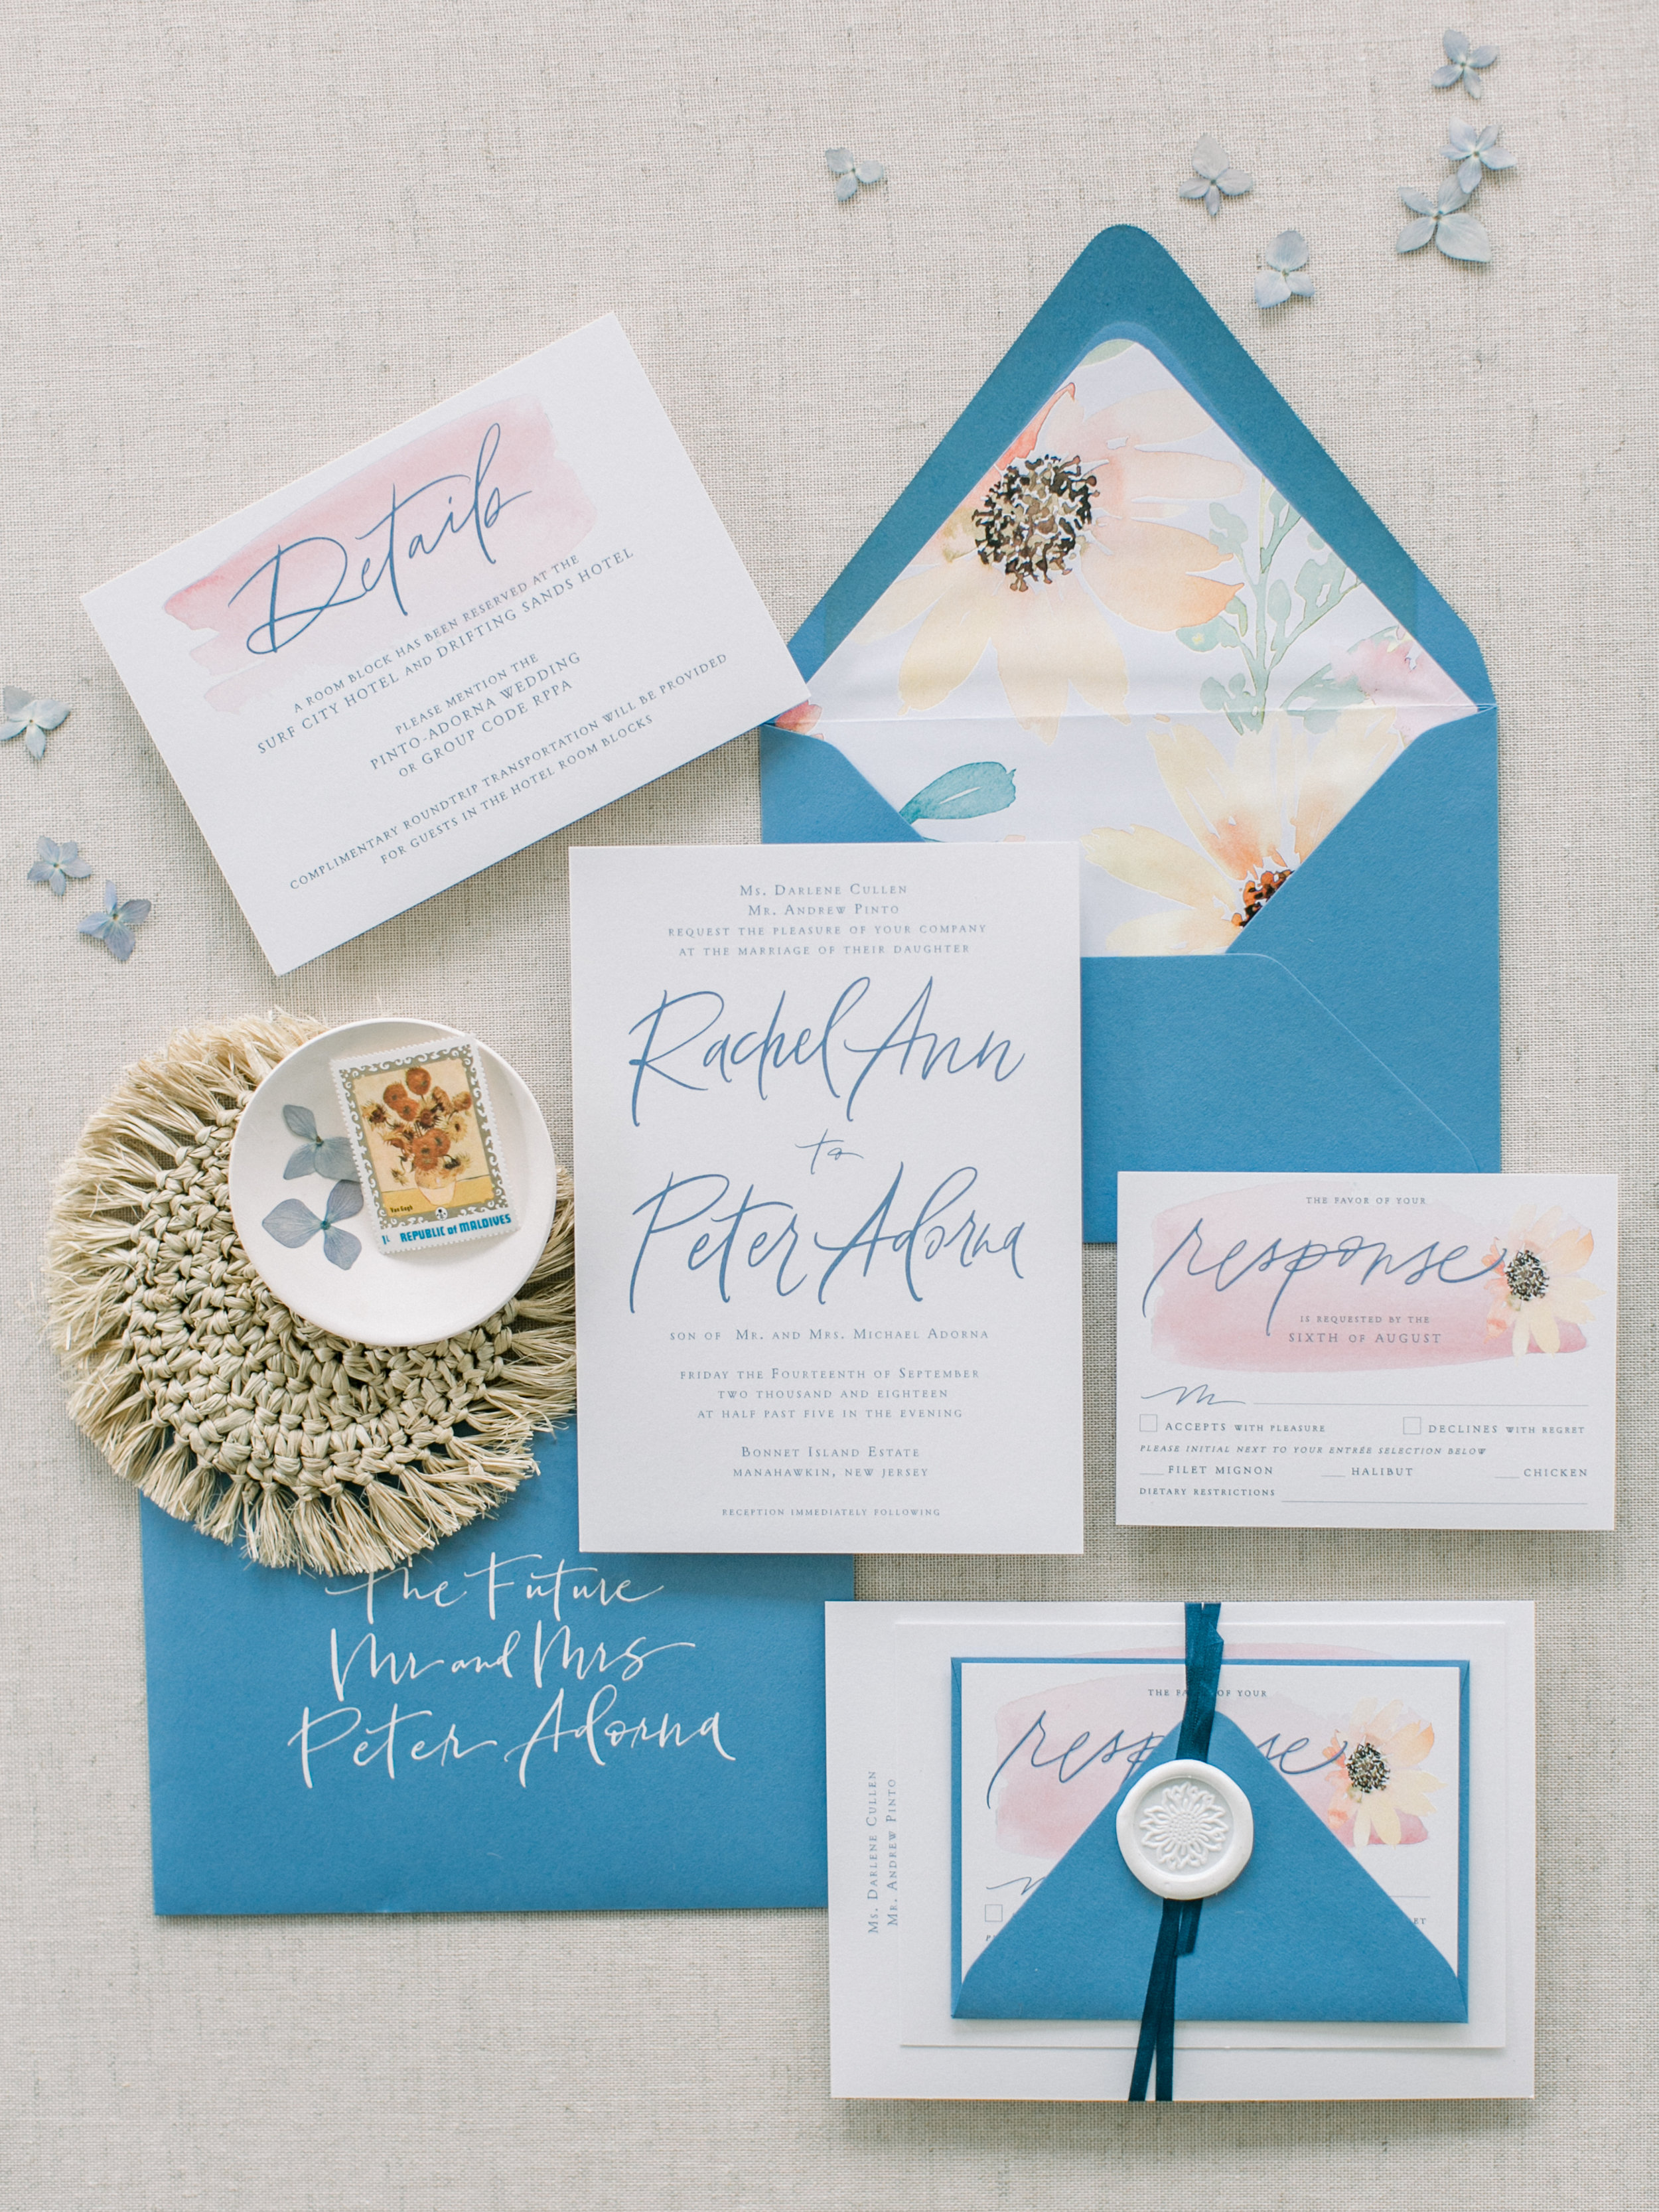 Rachel&Pete_9.14.2018_Wedding-1.jpg